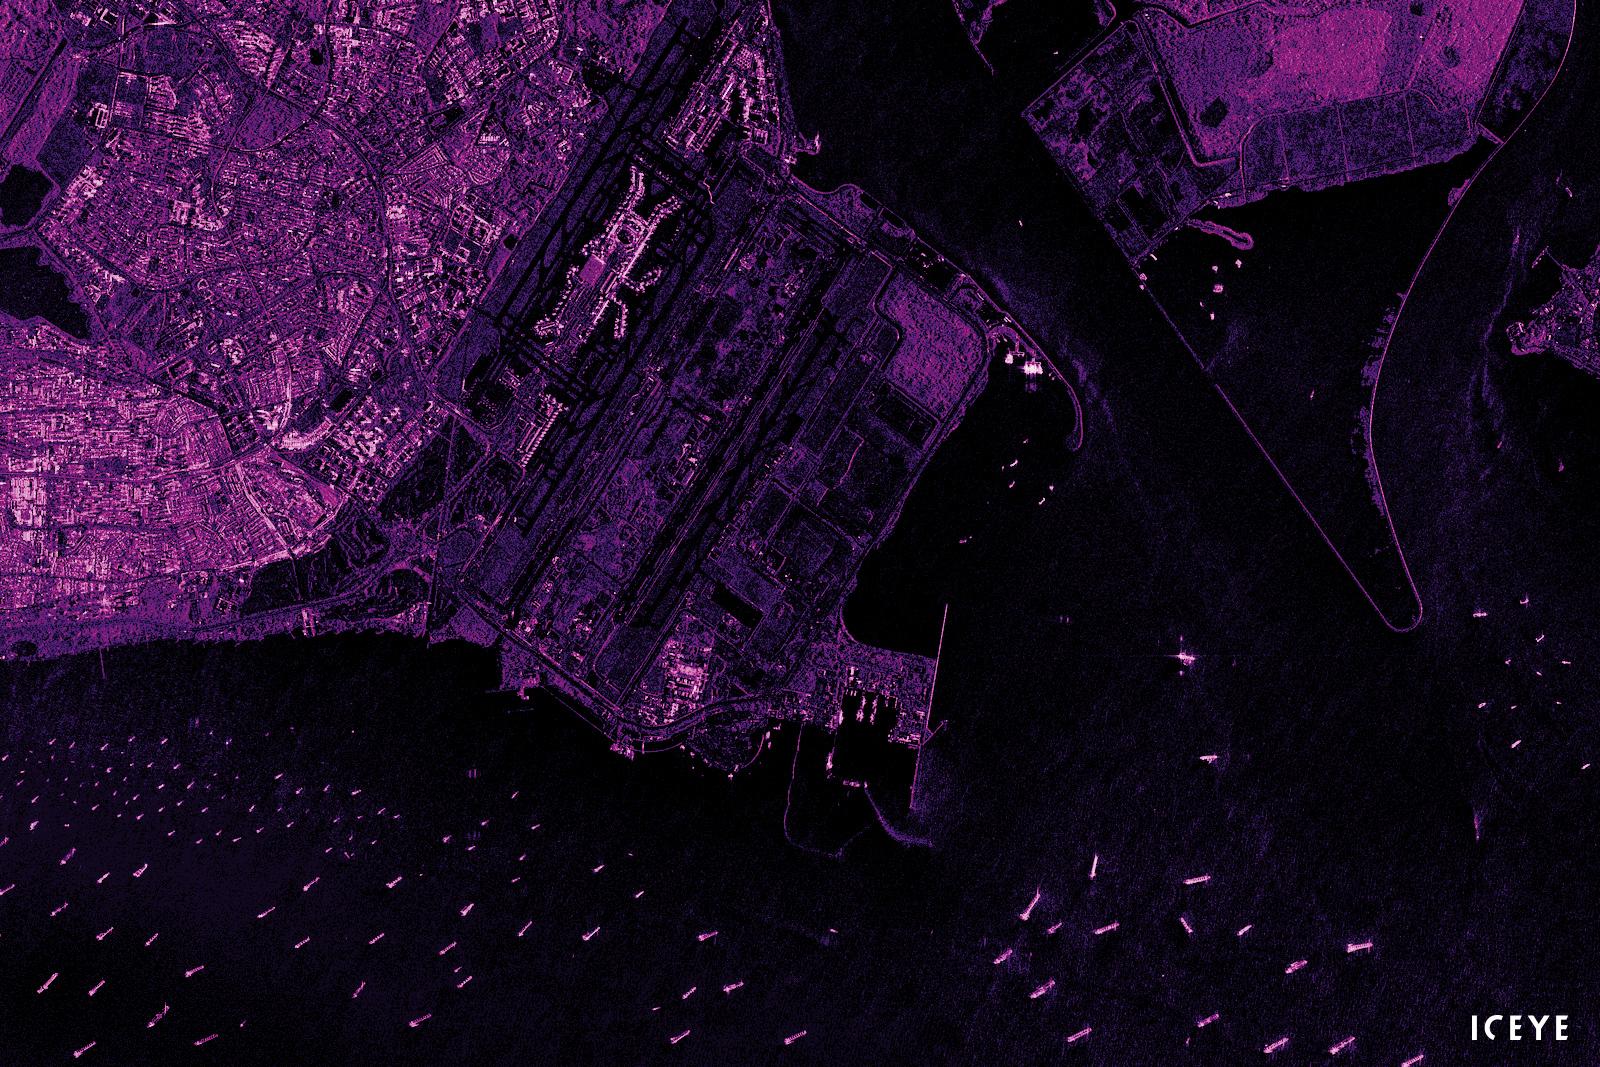 ICEYE-X2-Singapore-radar-satellite-image-compressed-edited-s